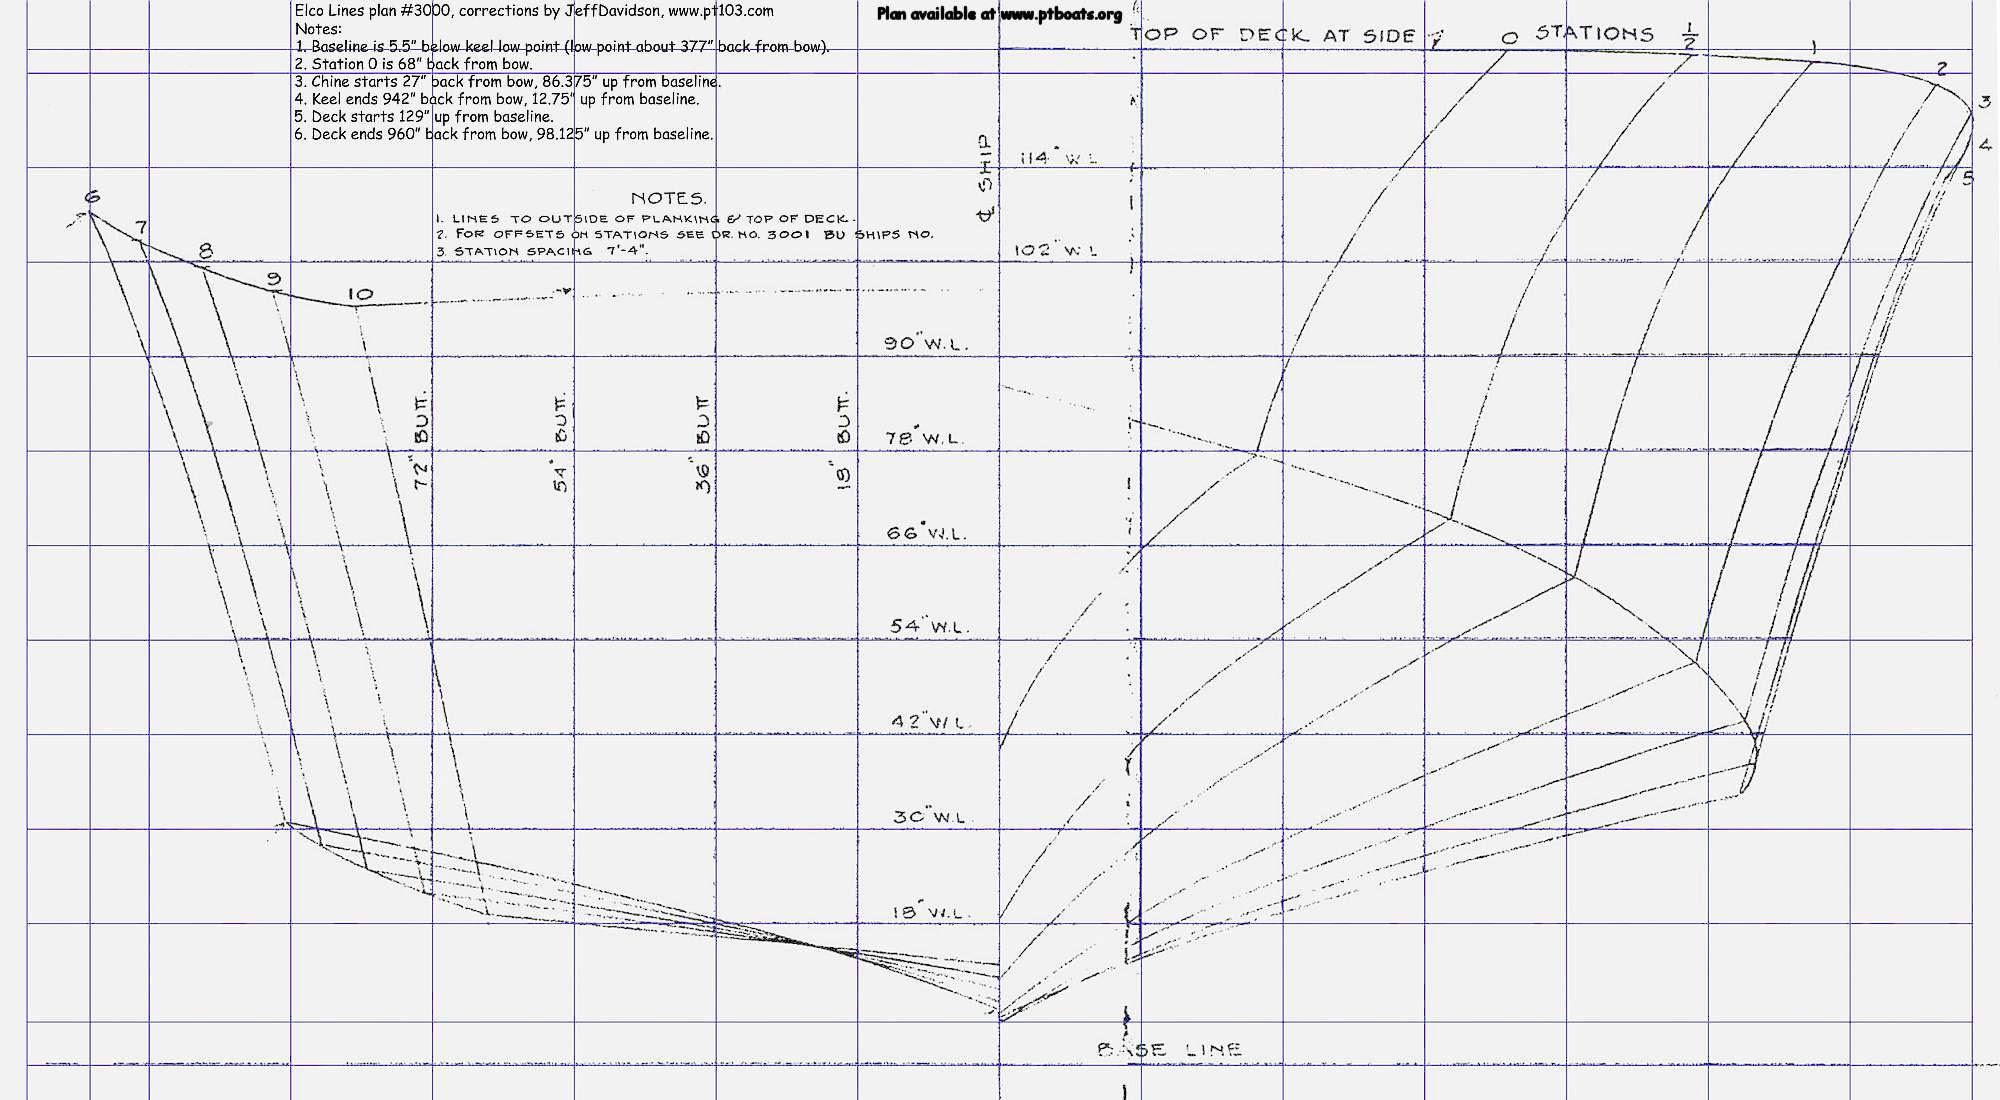 Free power boat plans download | Boat plan ideas